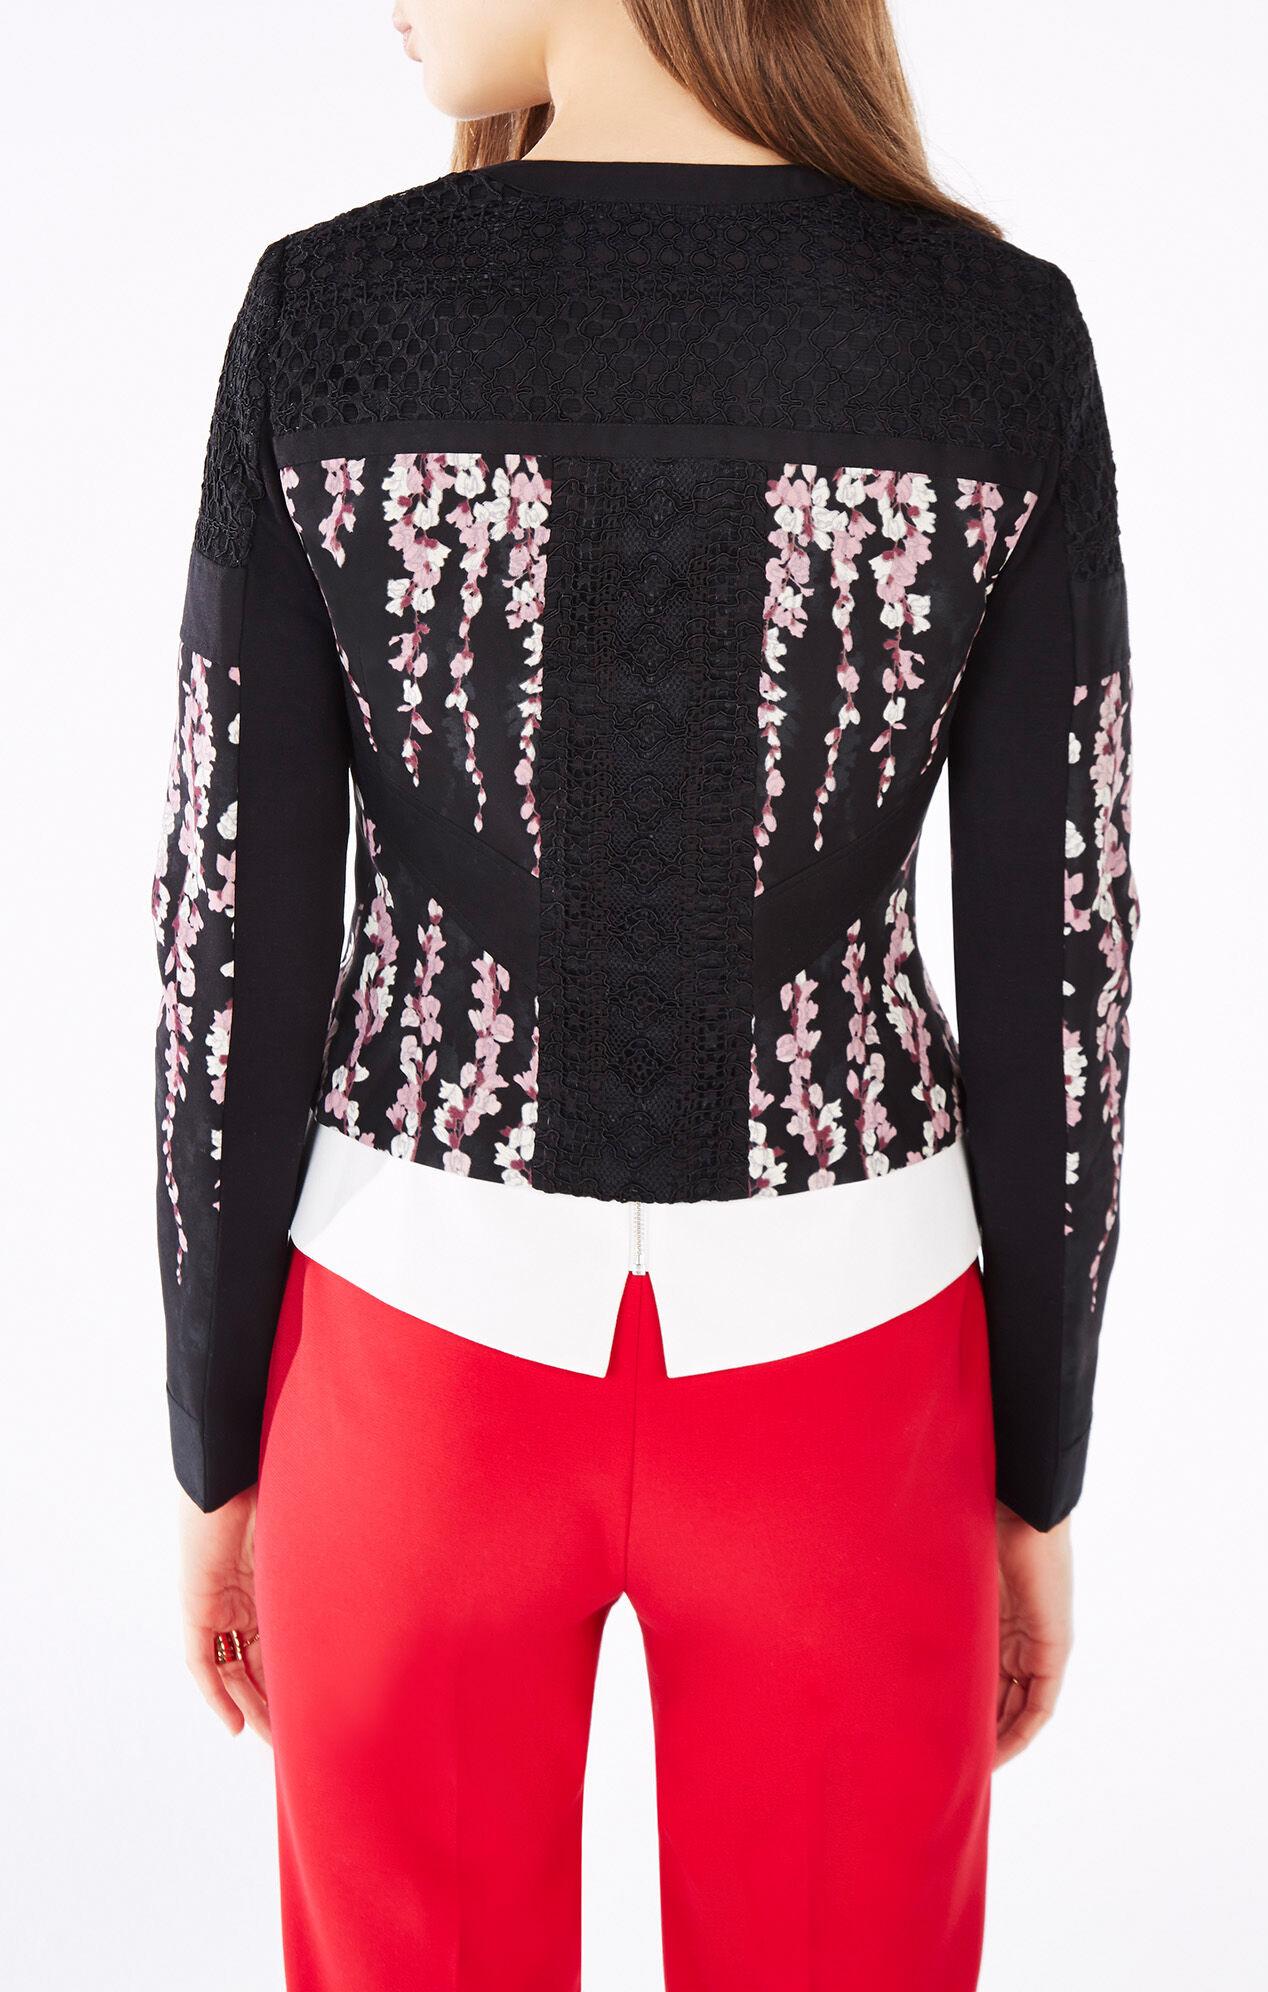 Tarik Floral Print-Blocked Jacket